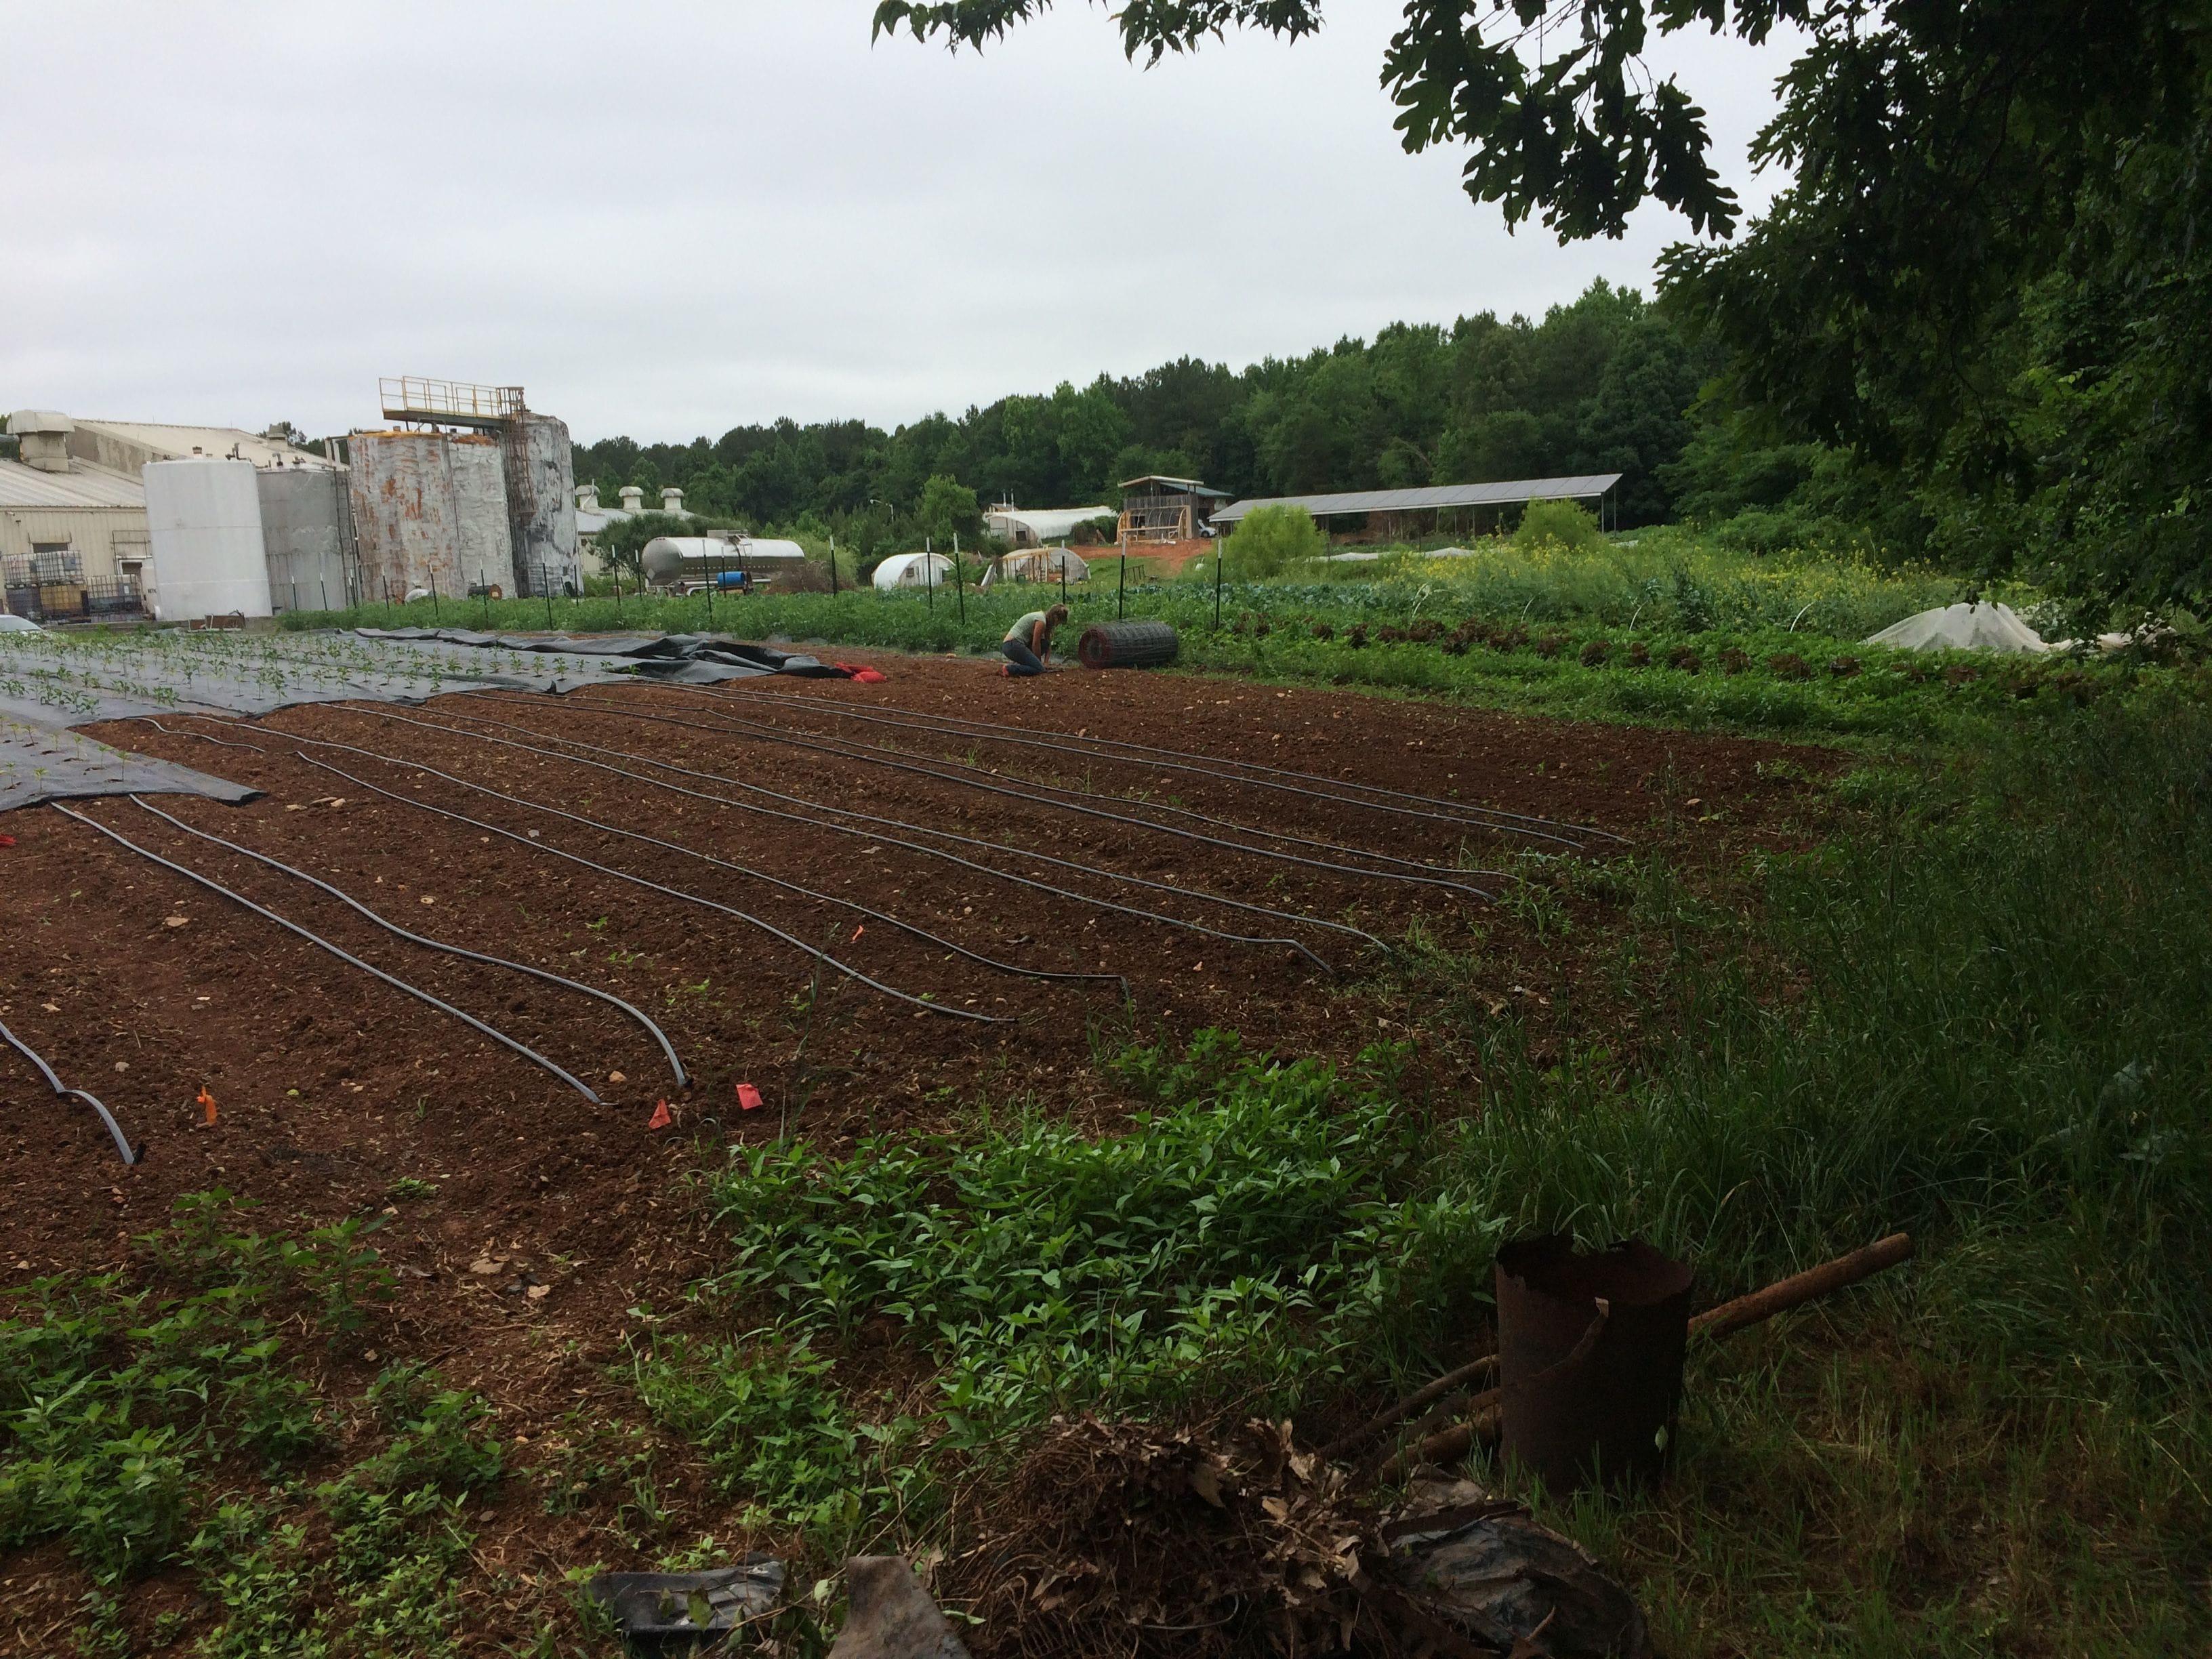 New Nature Interpretive Trail at The Plant – ABUNDANCE NC